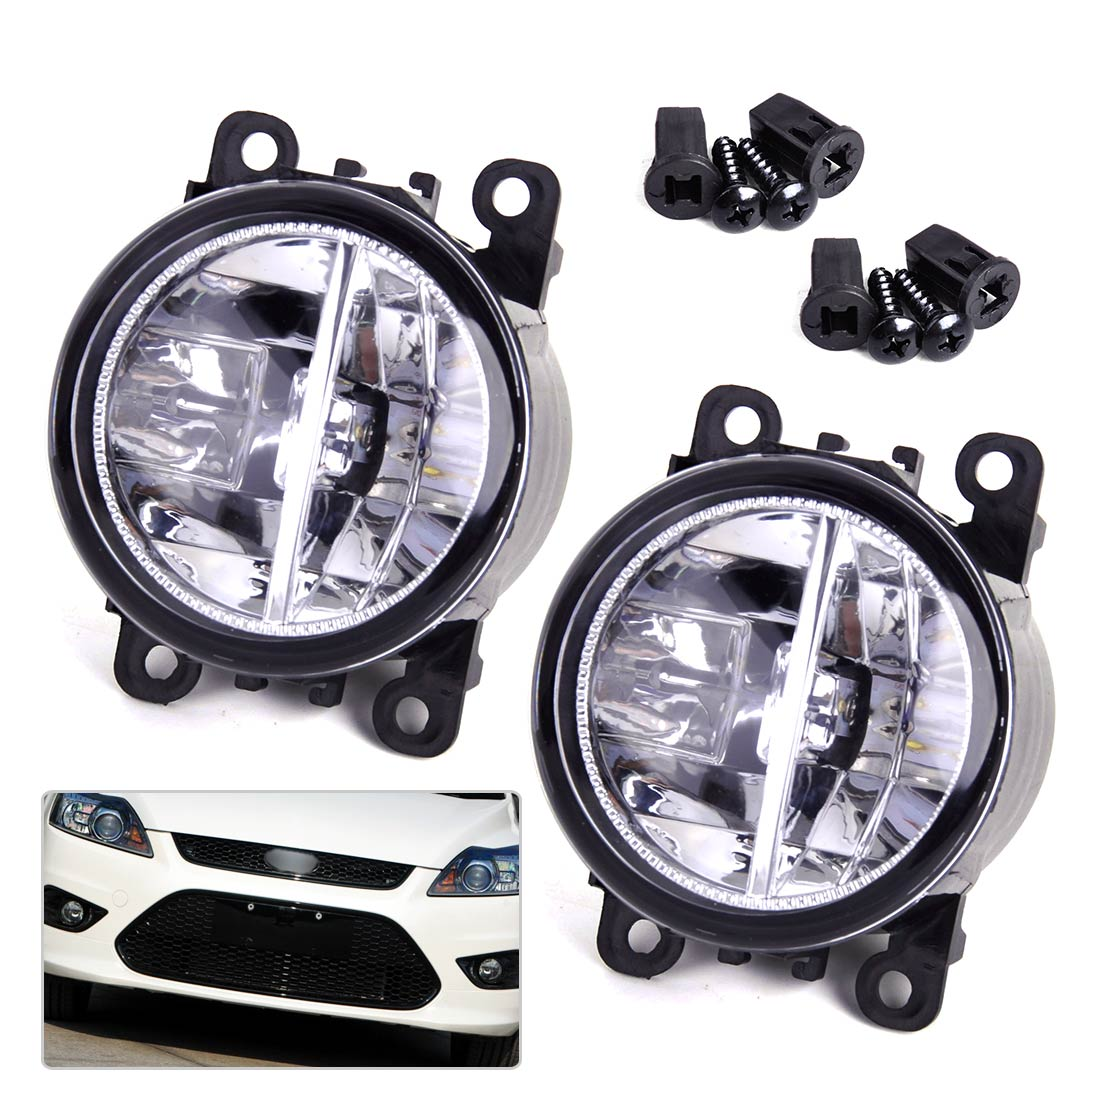 Pair Right Left LED Fog Light Lamp for Ford Focus Honda Acura Lincoln Nissan Subaru Suzuki 4F9Z-15200-AA 33900STKA11 AC2592111<br>